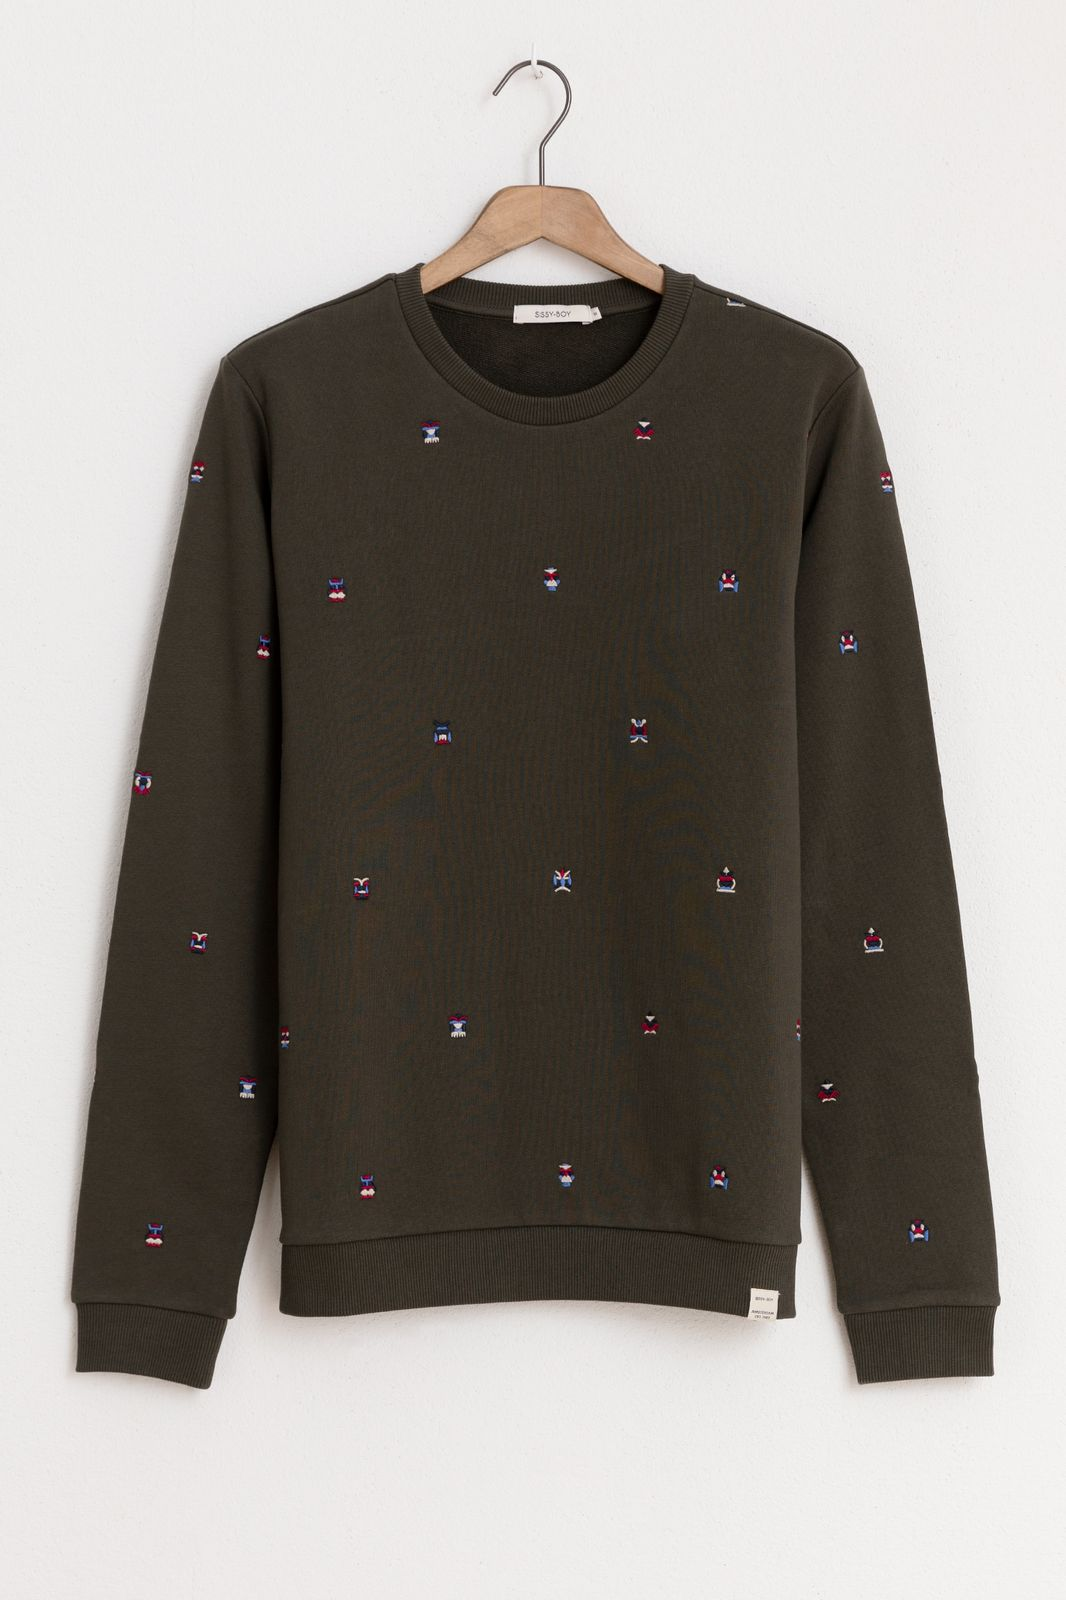 Donkergroene sweater met borduursels - Heren | Sissy-Boy